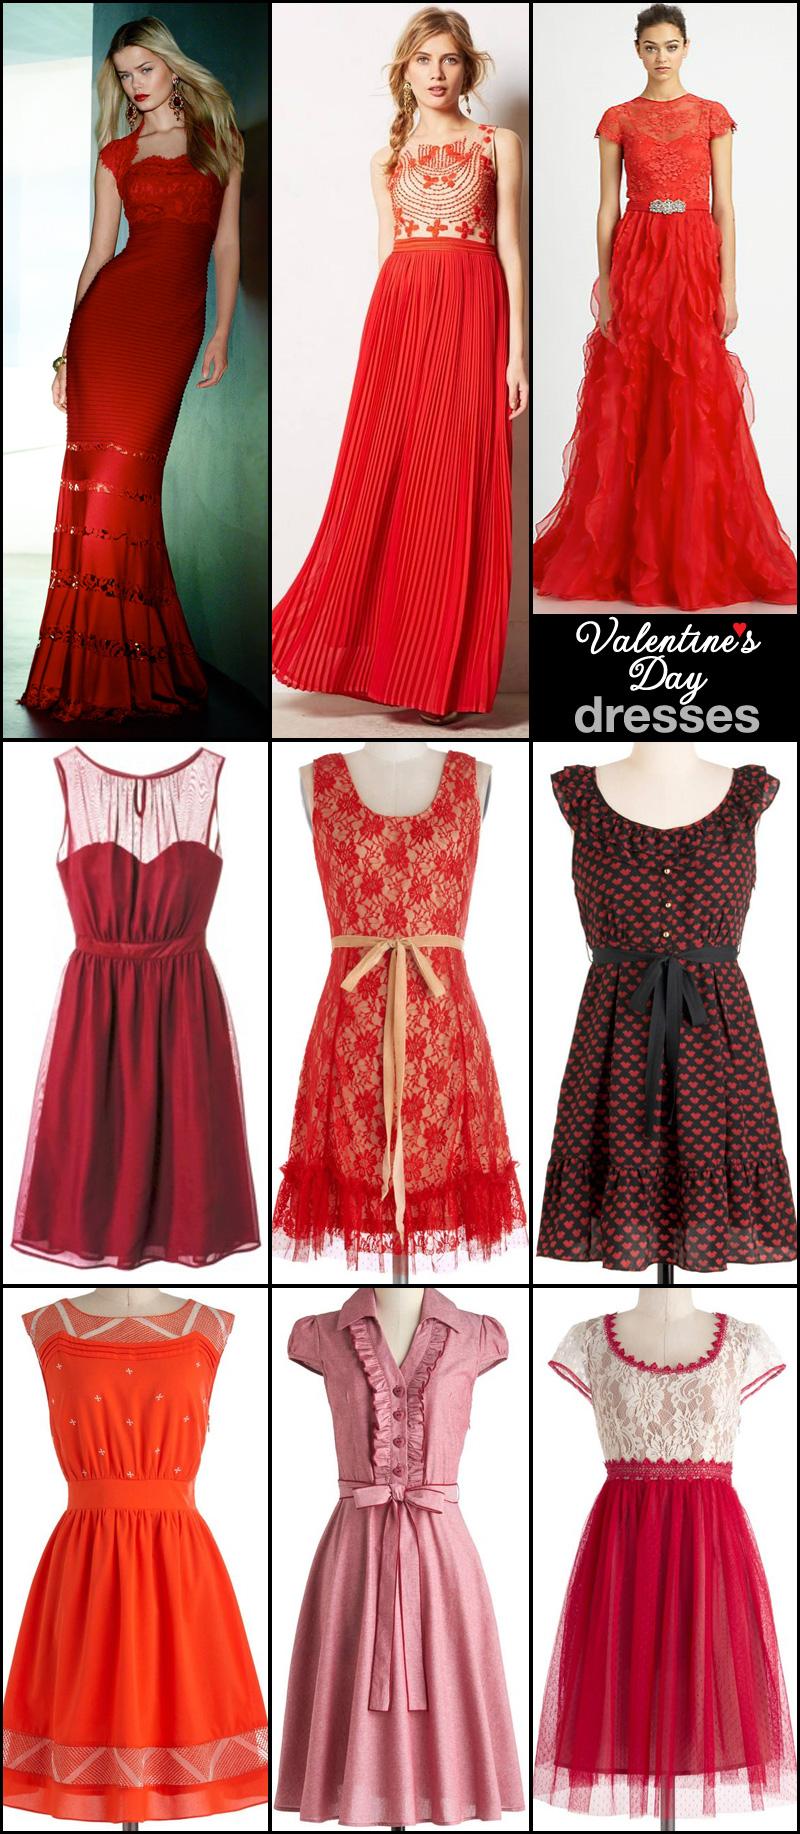 Red Valentine's Day Dresses